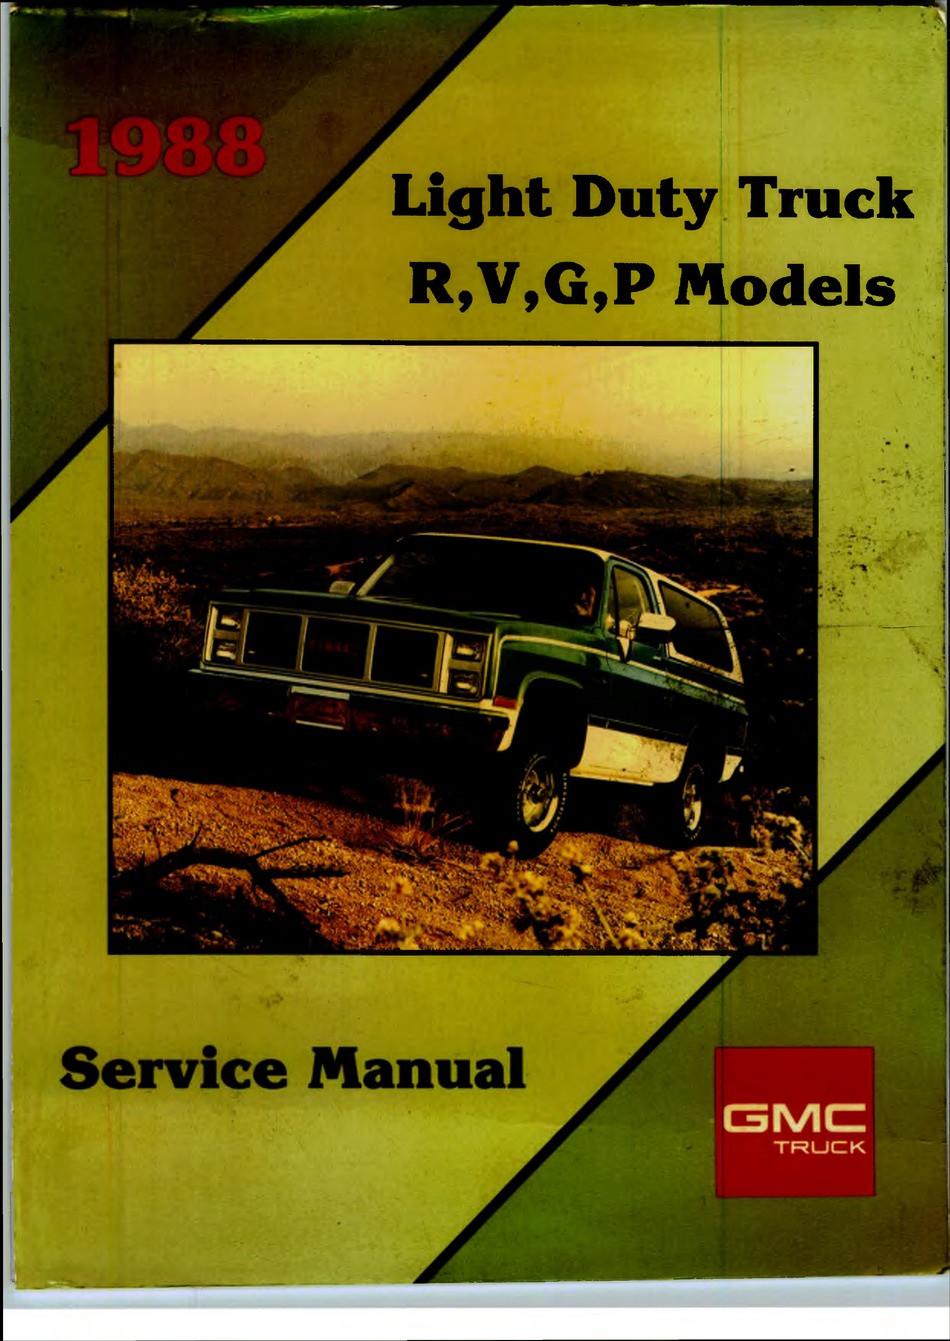 Wiringdiagram for Chevy Pickup 84 3/4 ton 292 Engine 2 Wheel Drfor Radio Gmc G Service Manual Pdf Download Manualslib Of Wiringdiagram for Chevy Pickup 84 3/4 ton 292 Engine 2 Wheel Drfor Radio